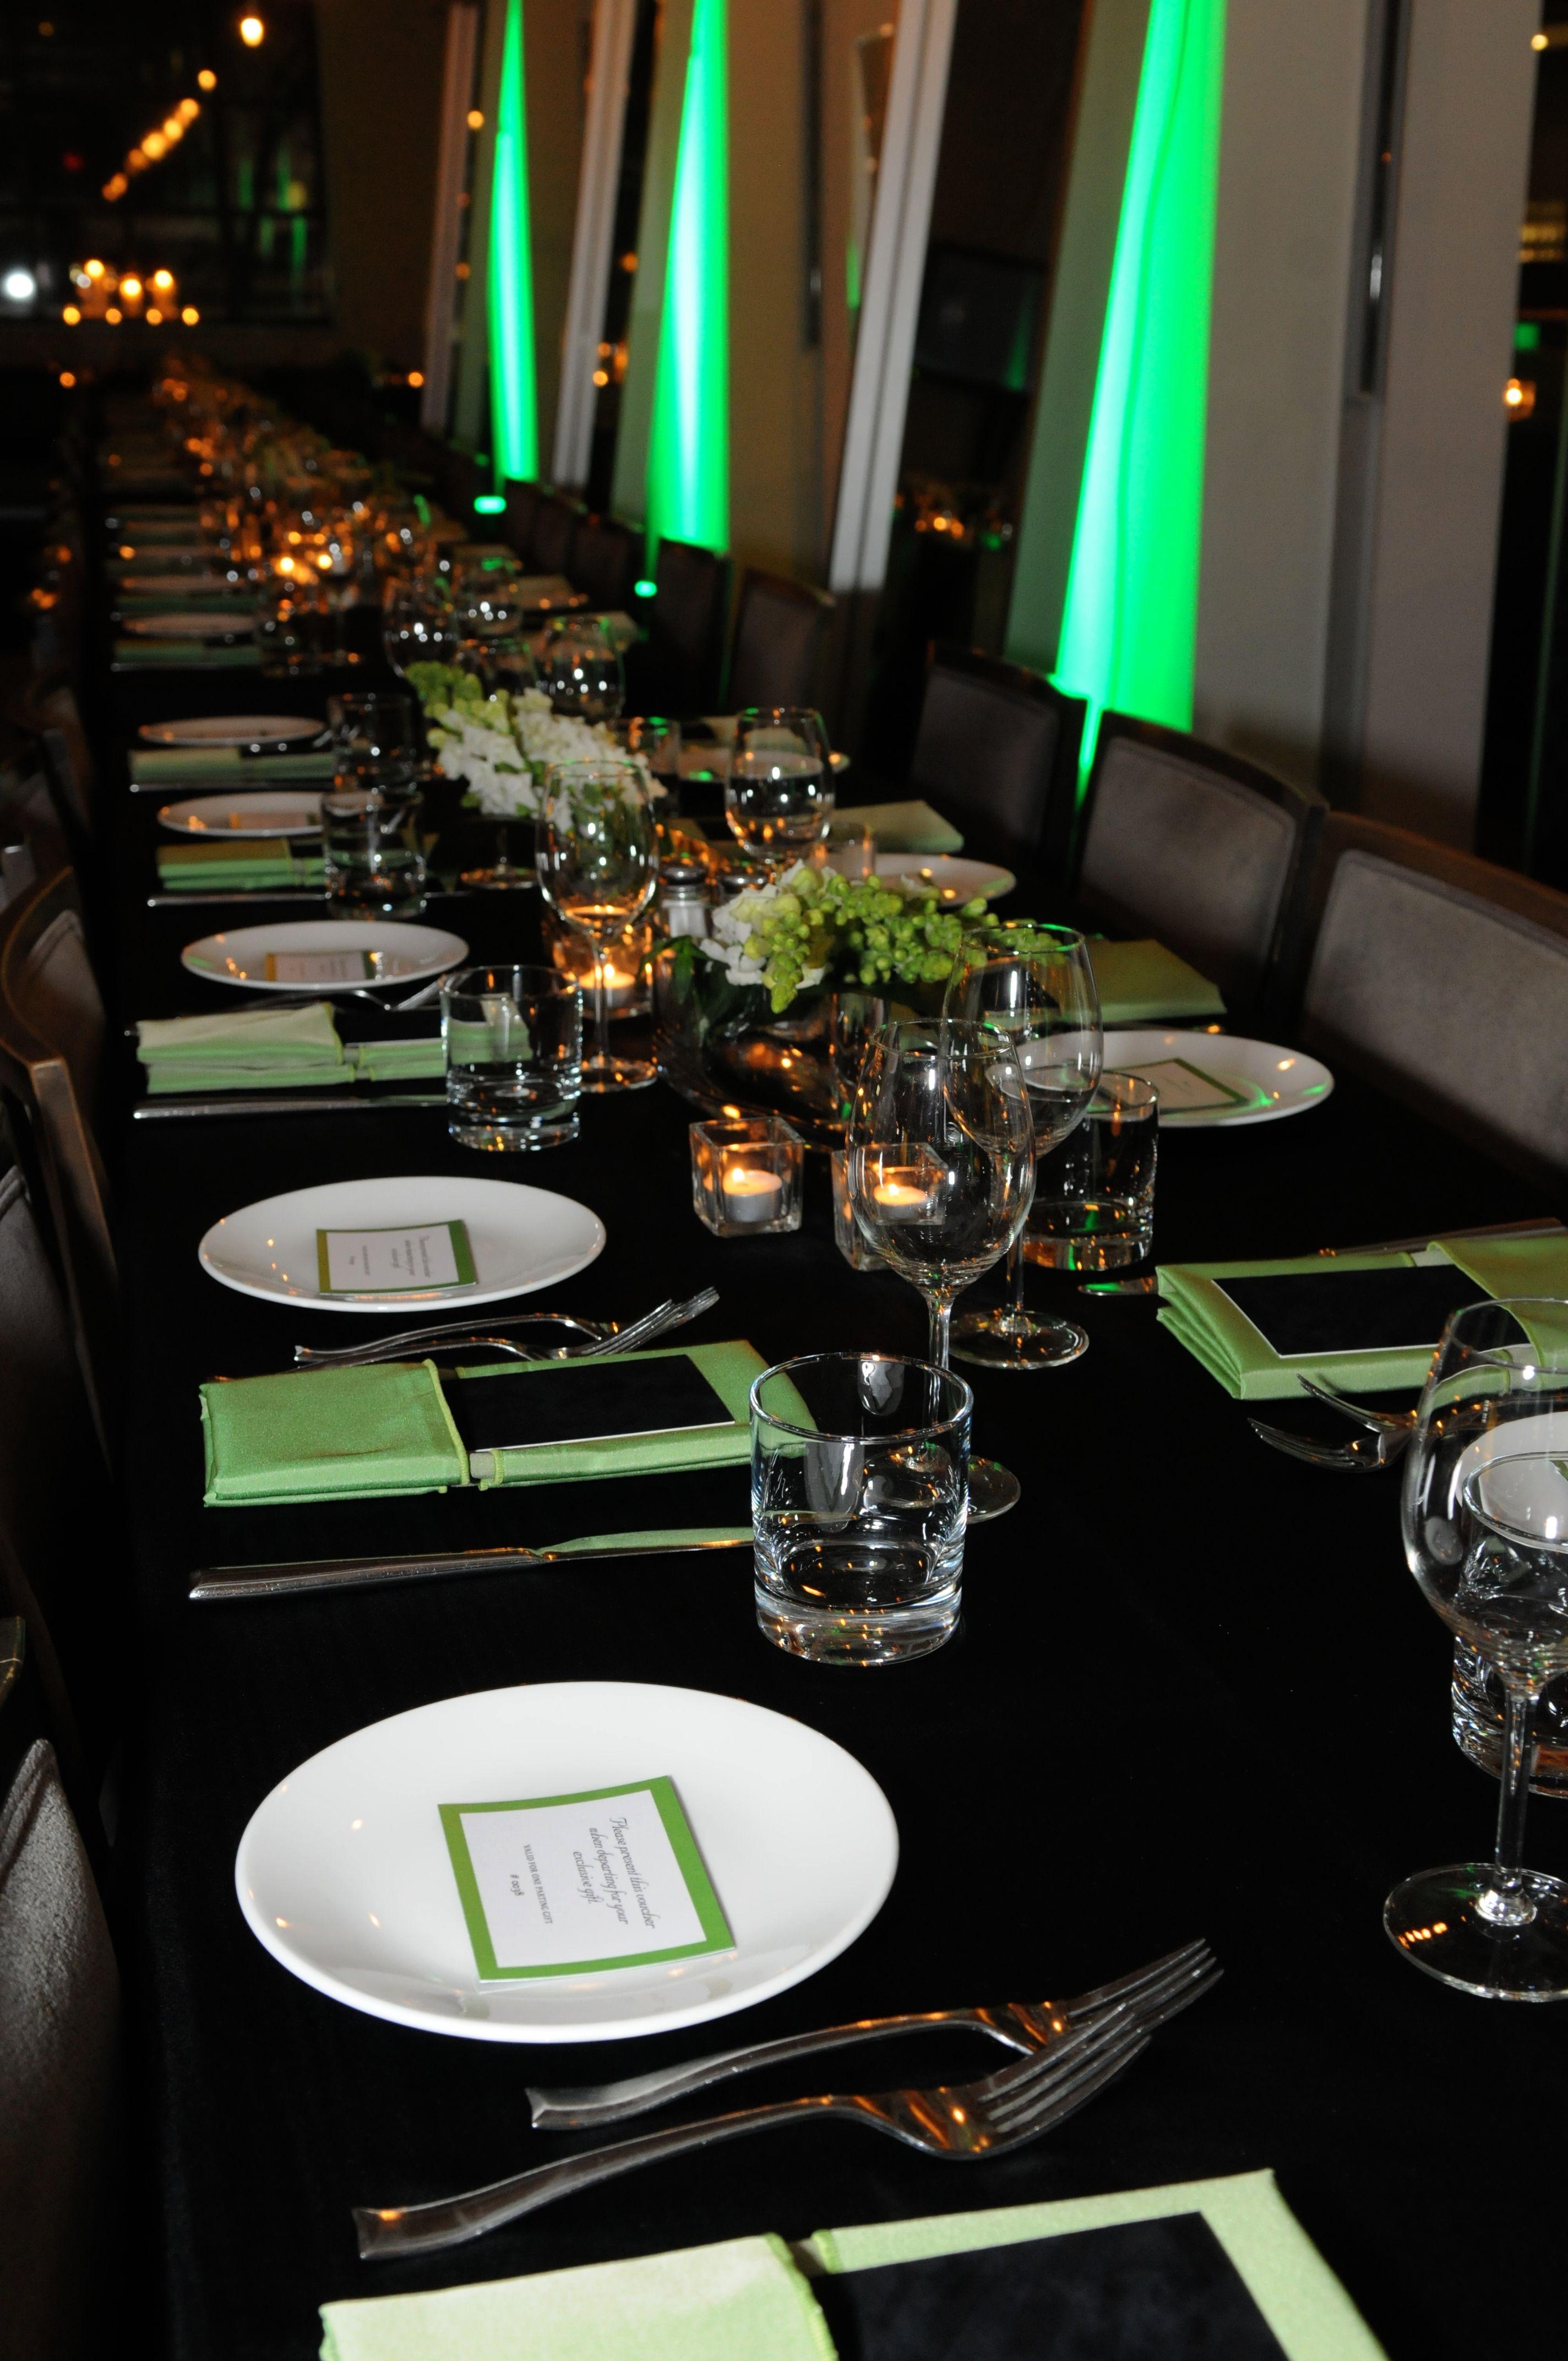 Green, White & Black Color Theme